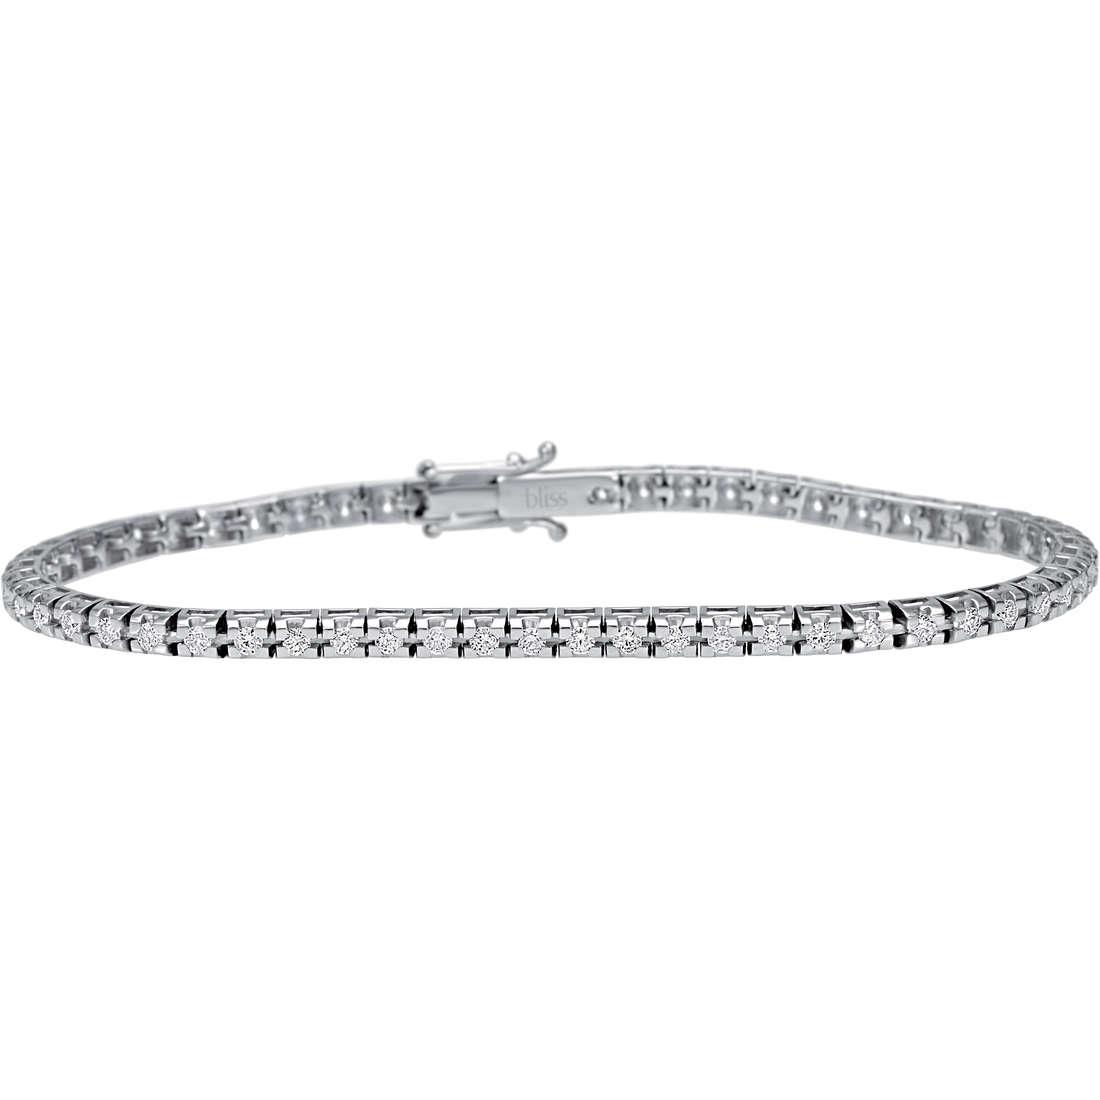 bracelet woman jewellery Bliss First class 20061013